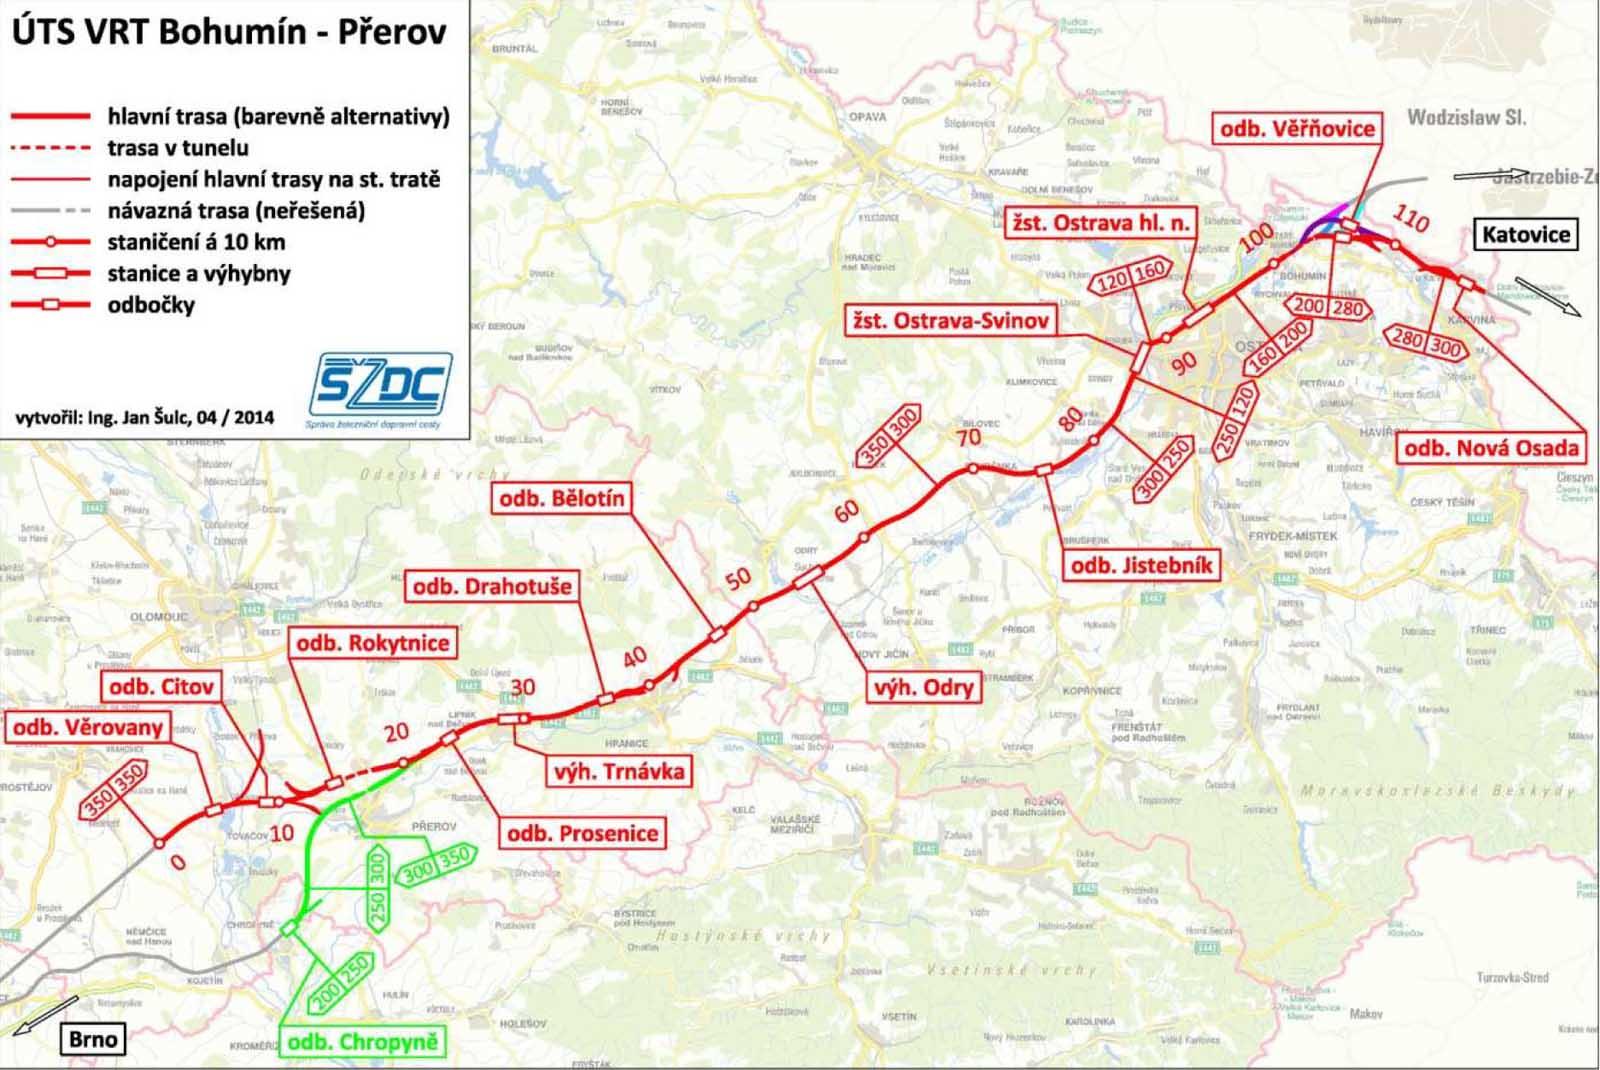 vysokorychlostní trať Brno - Ostrava